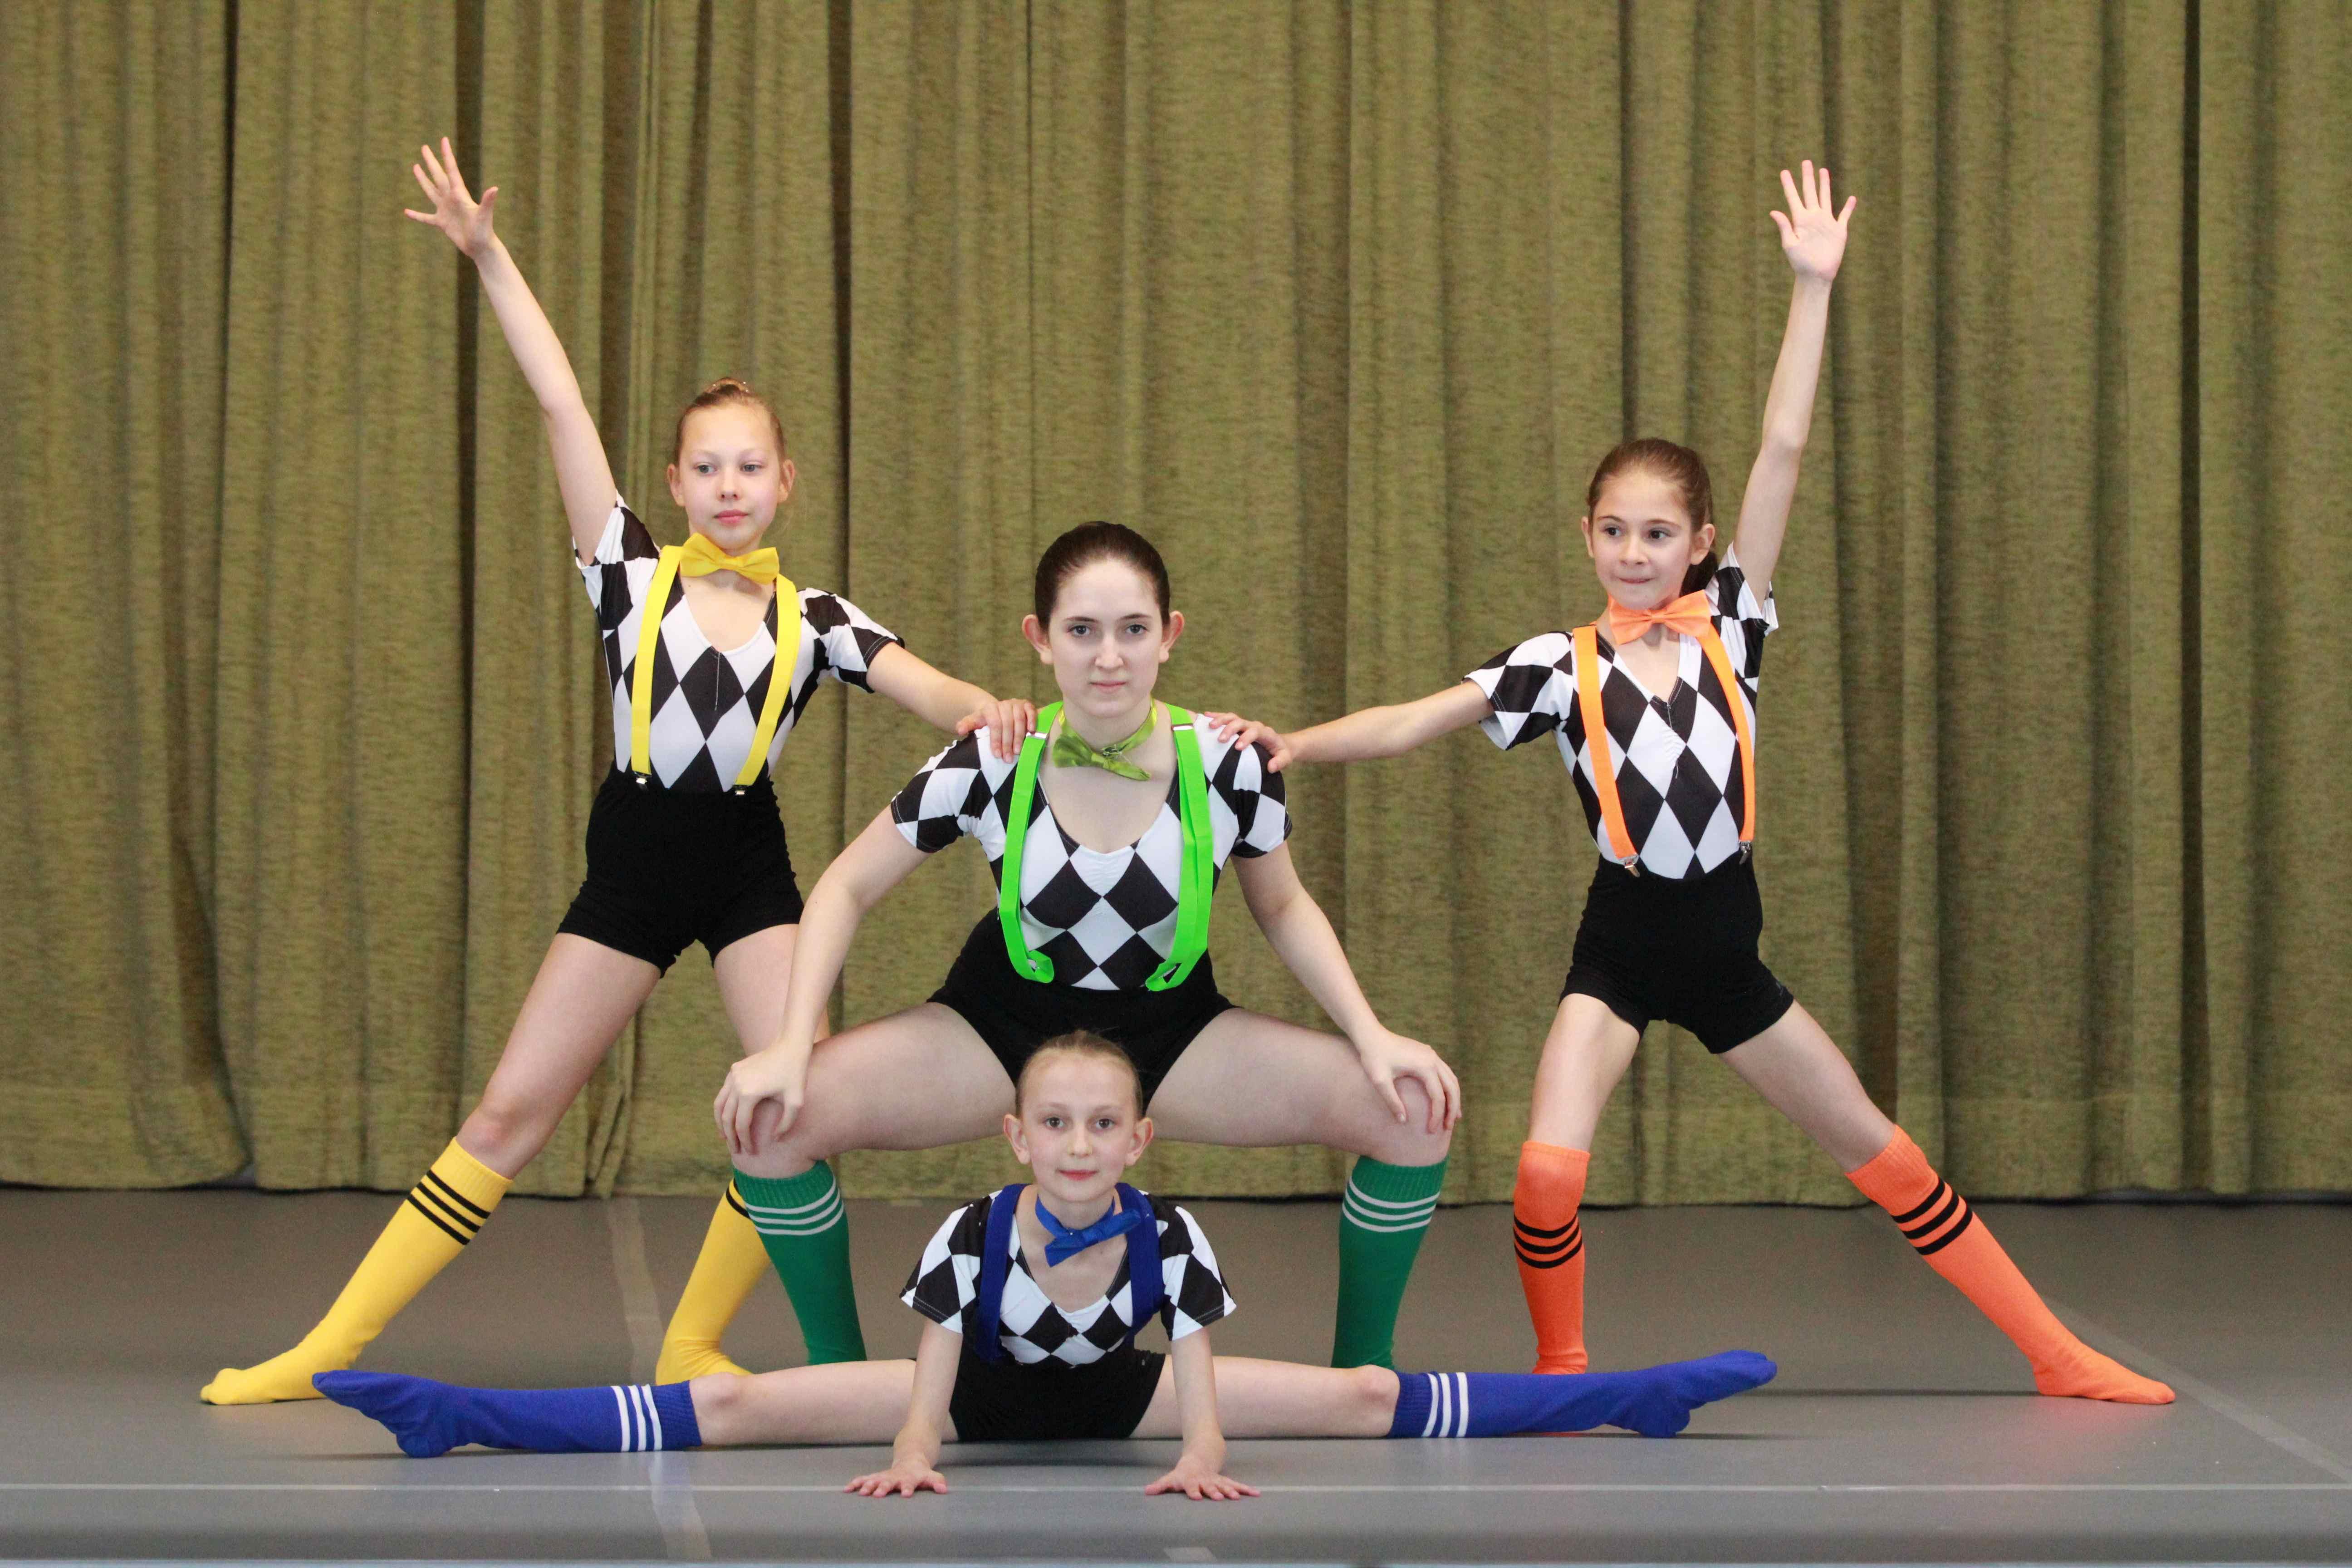 Ballettschule Kaiserslautern Aufführung 2017